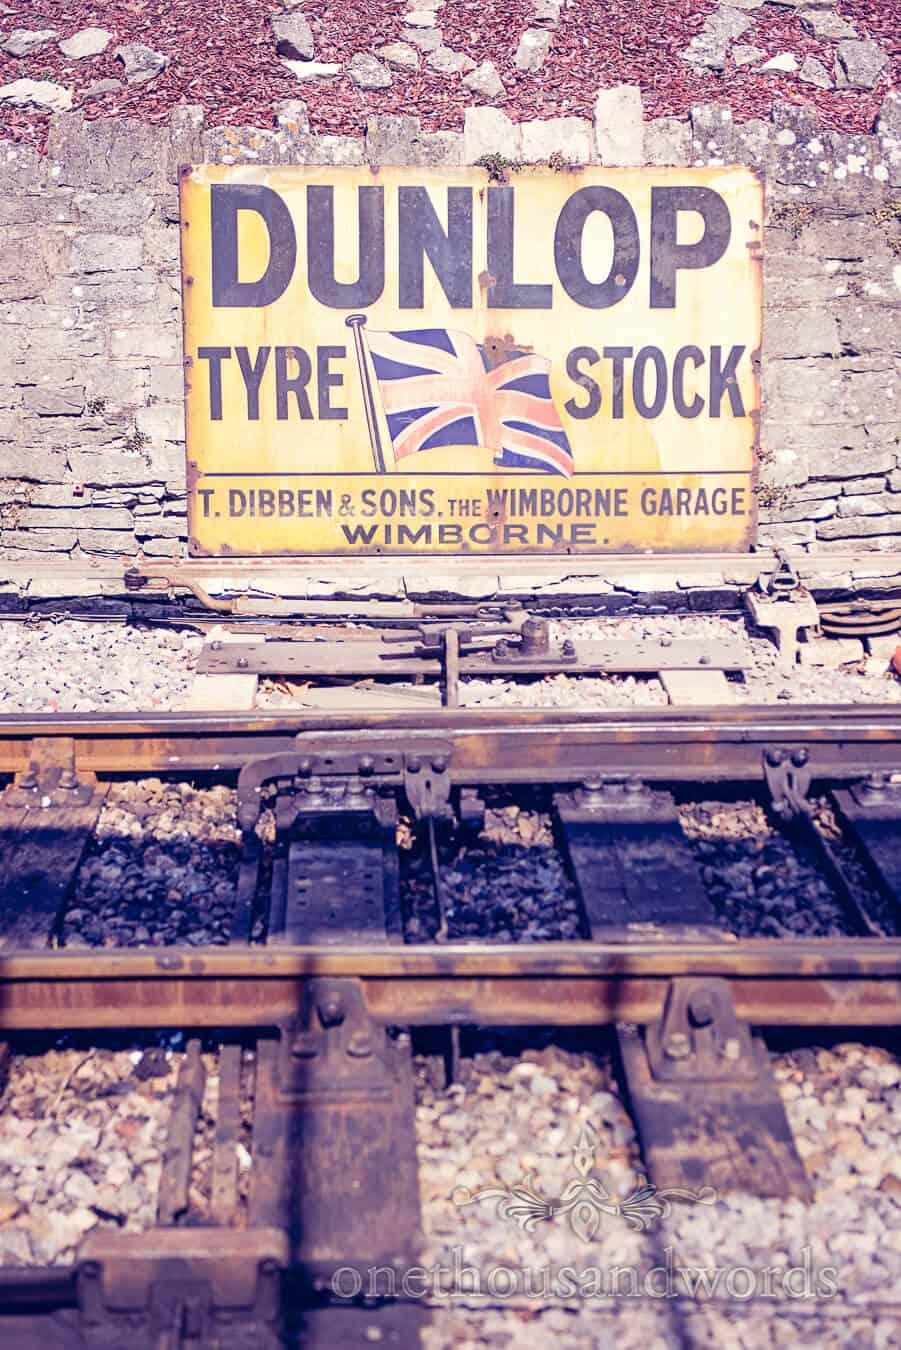 Retro Dunlop Sign at Steam railway station in Dorset